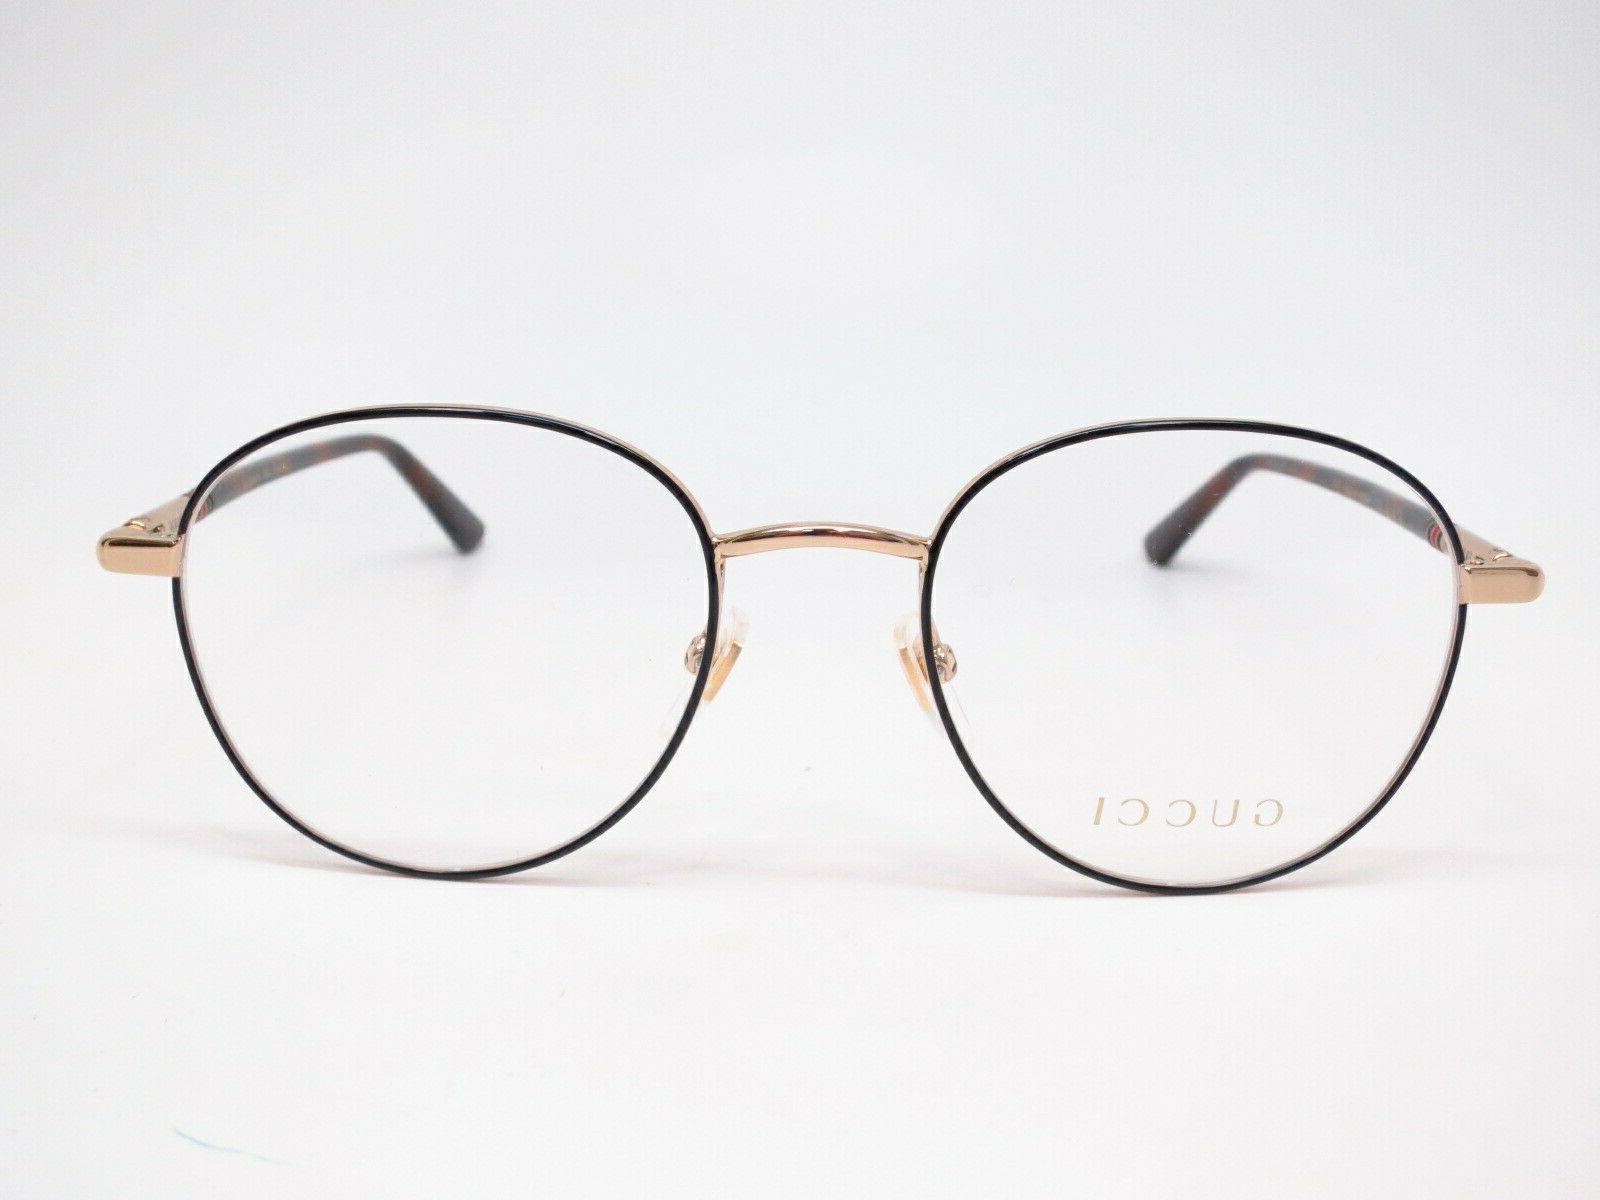 New Authentic Gucci 002 Eyewear Eyeglasses 51mm